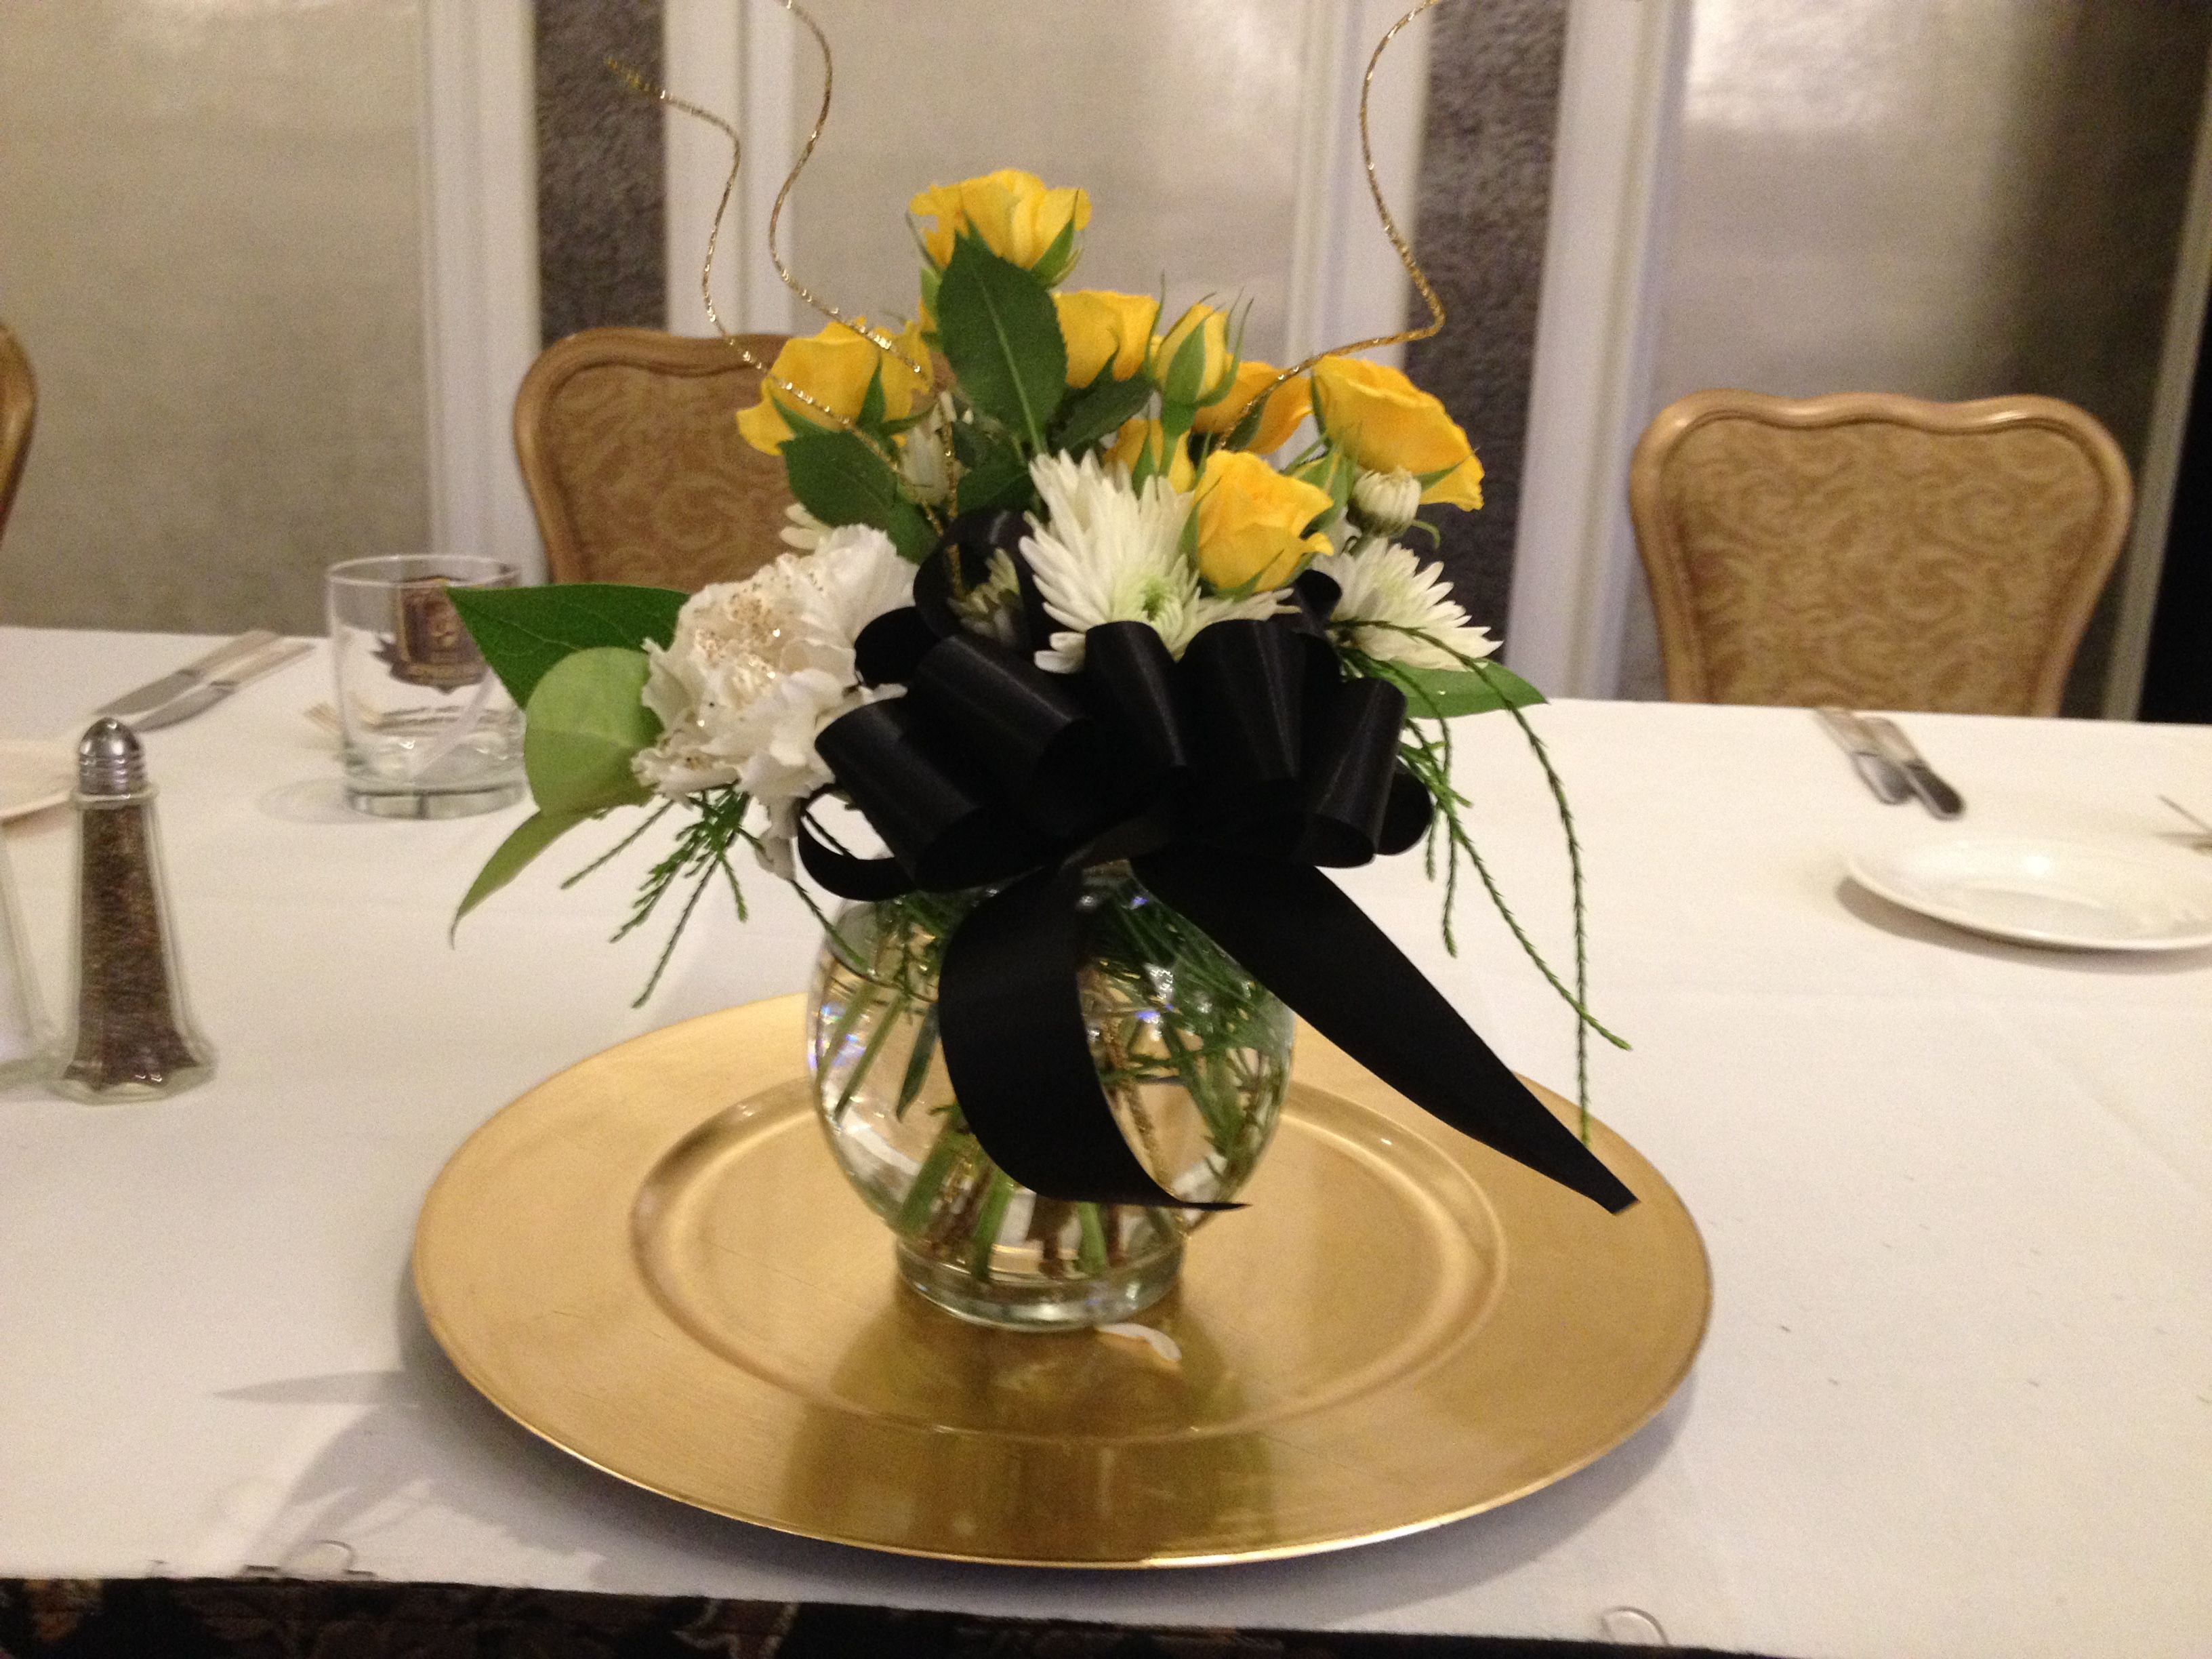 Ivy Bowl Centerpiece Weddings On A Dime Pinterest & Ivy Bowl Centerpiece Ideas | New House Designs